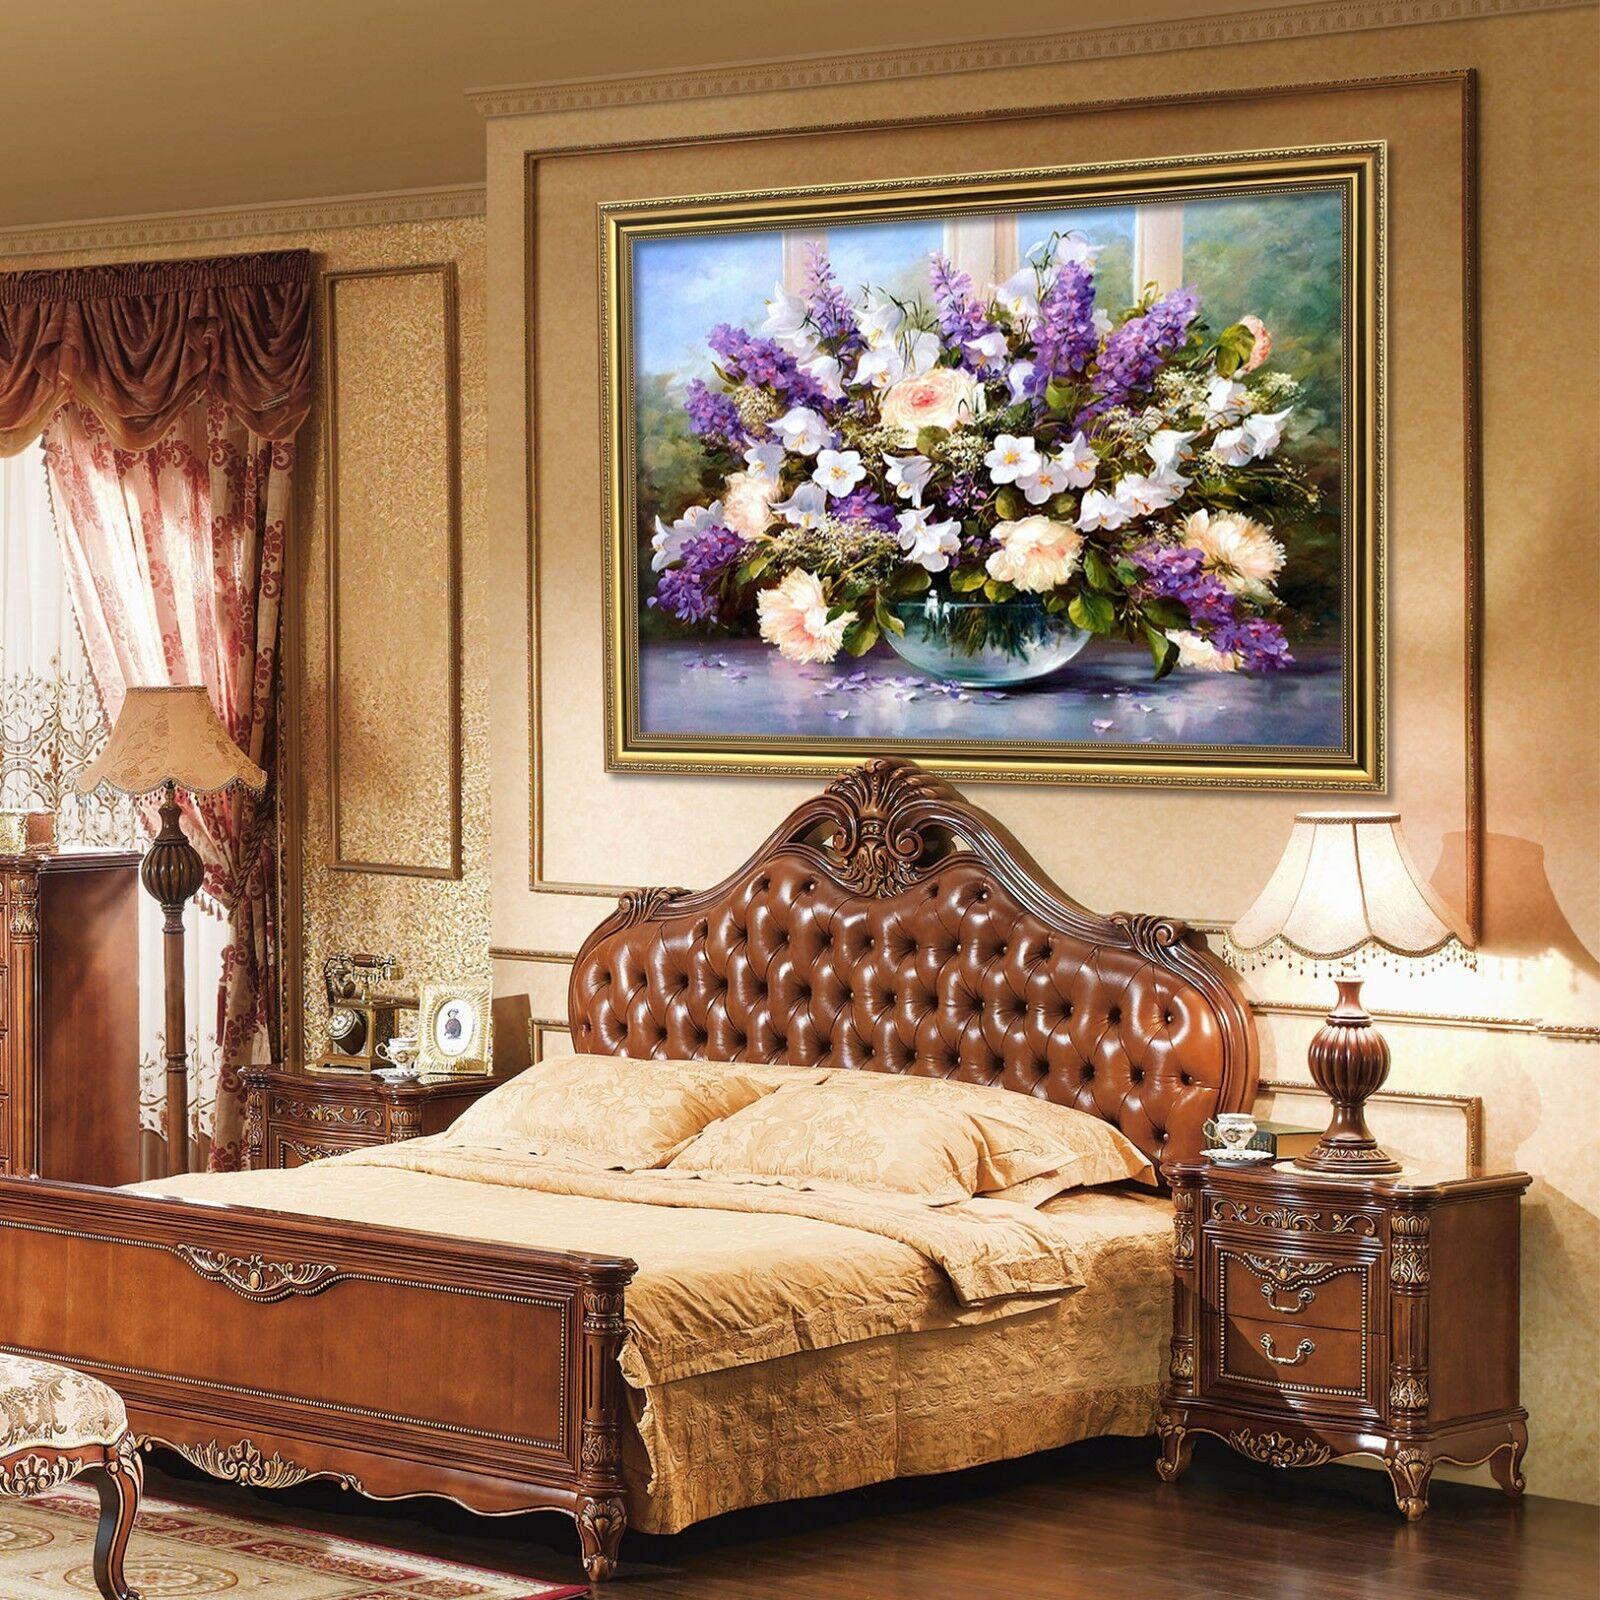 3D Lavender Bouquet 6 Framed Poster Home Decor Print Painting Art AJ WALLPAPER